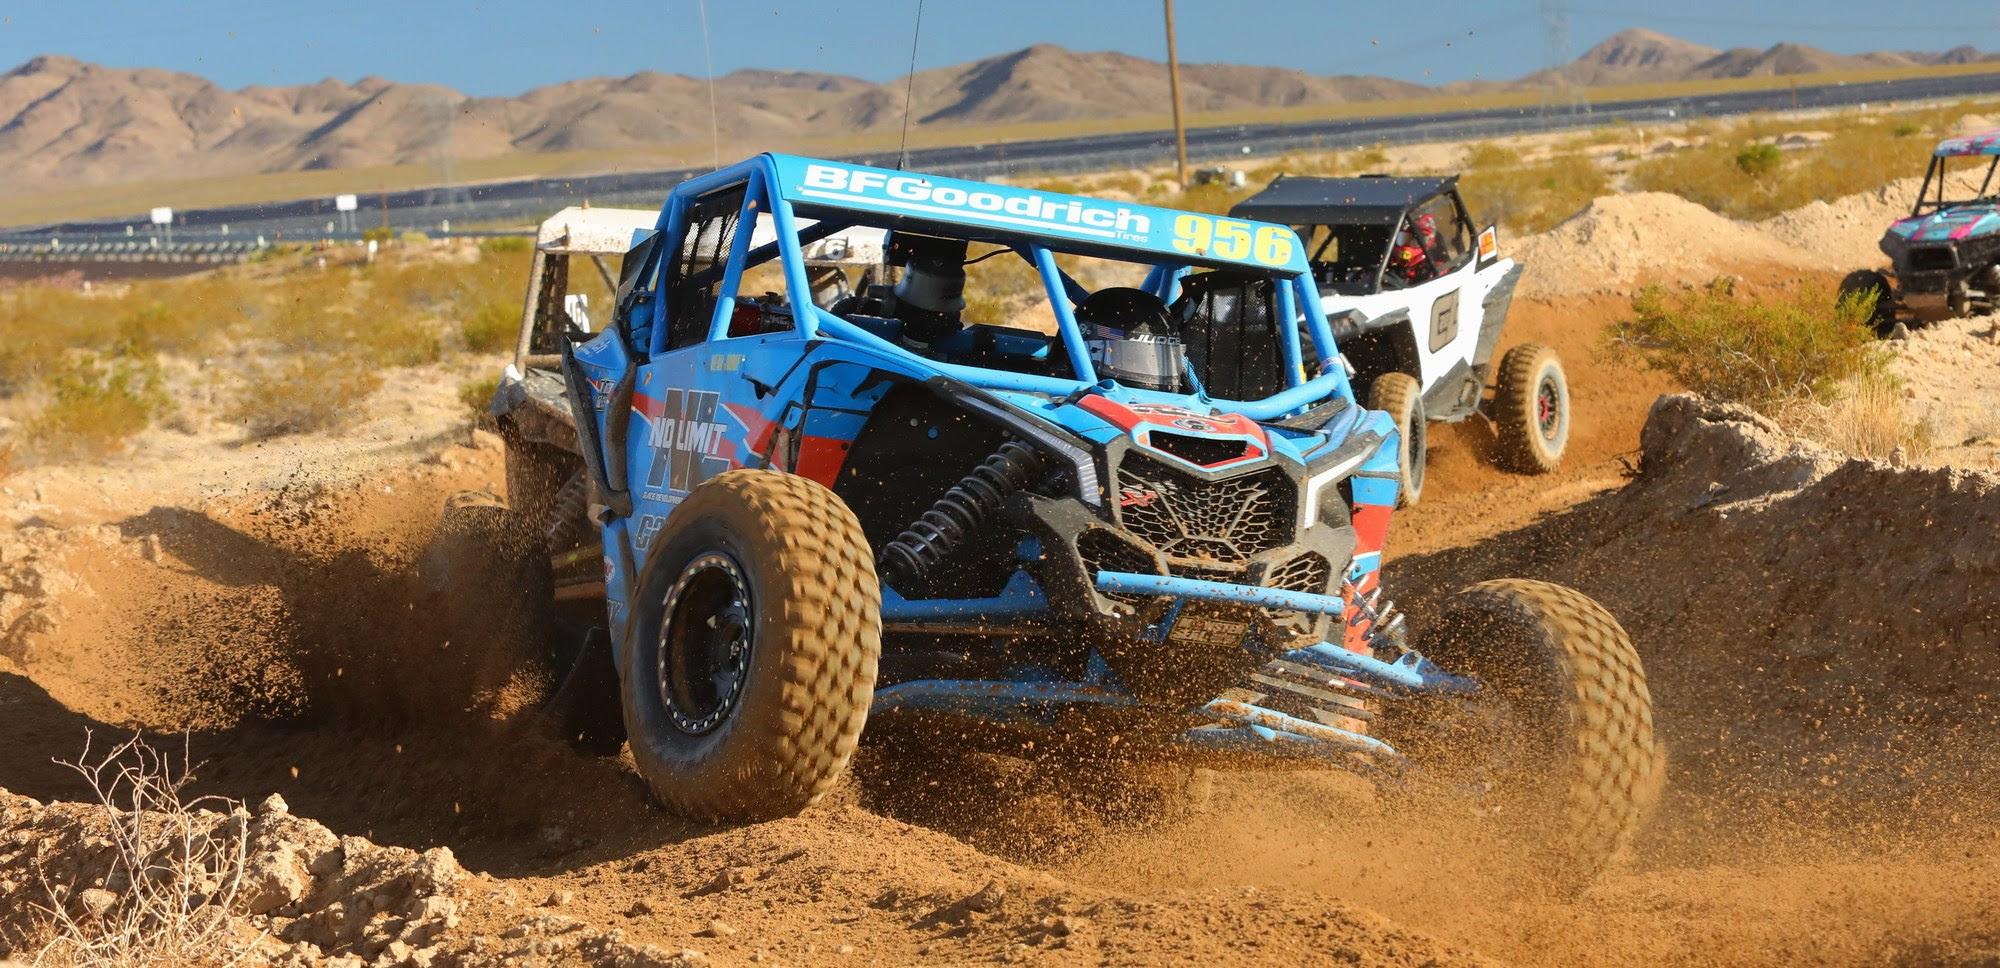 2018-09-beau-judge-desert-roost-utv-worcs-racing